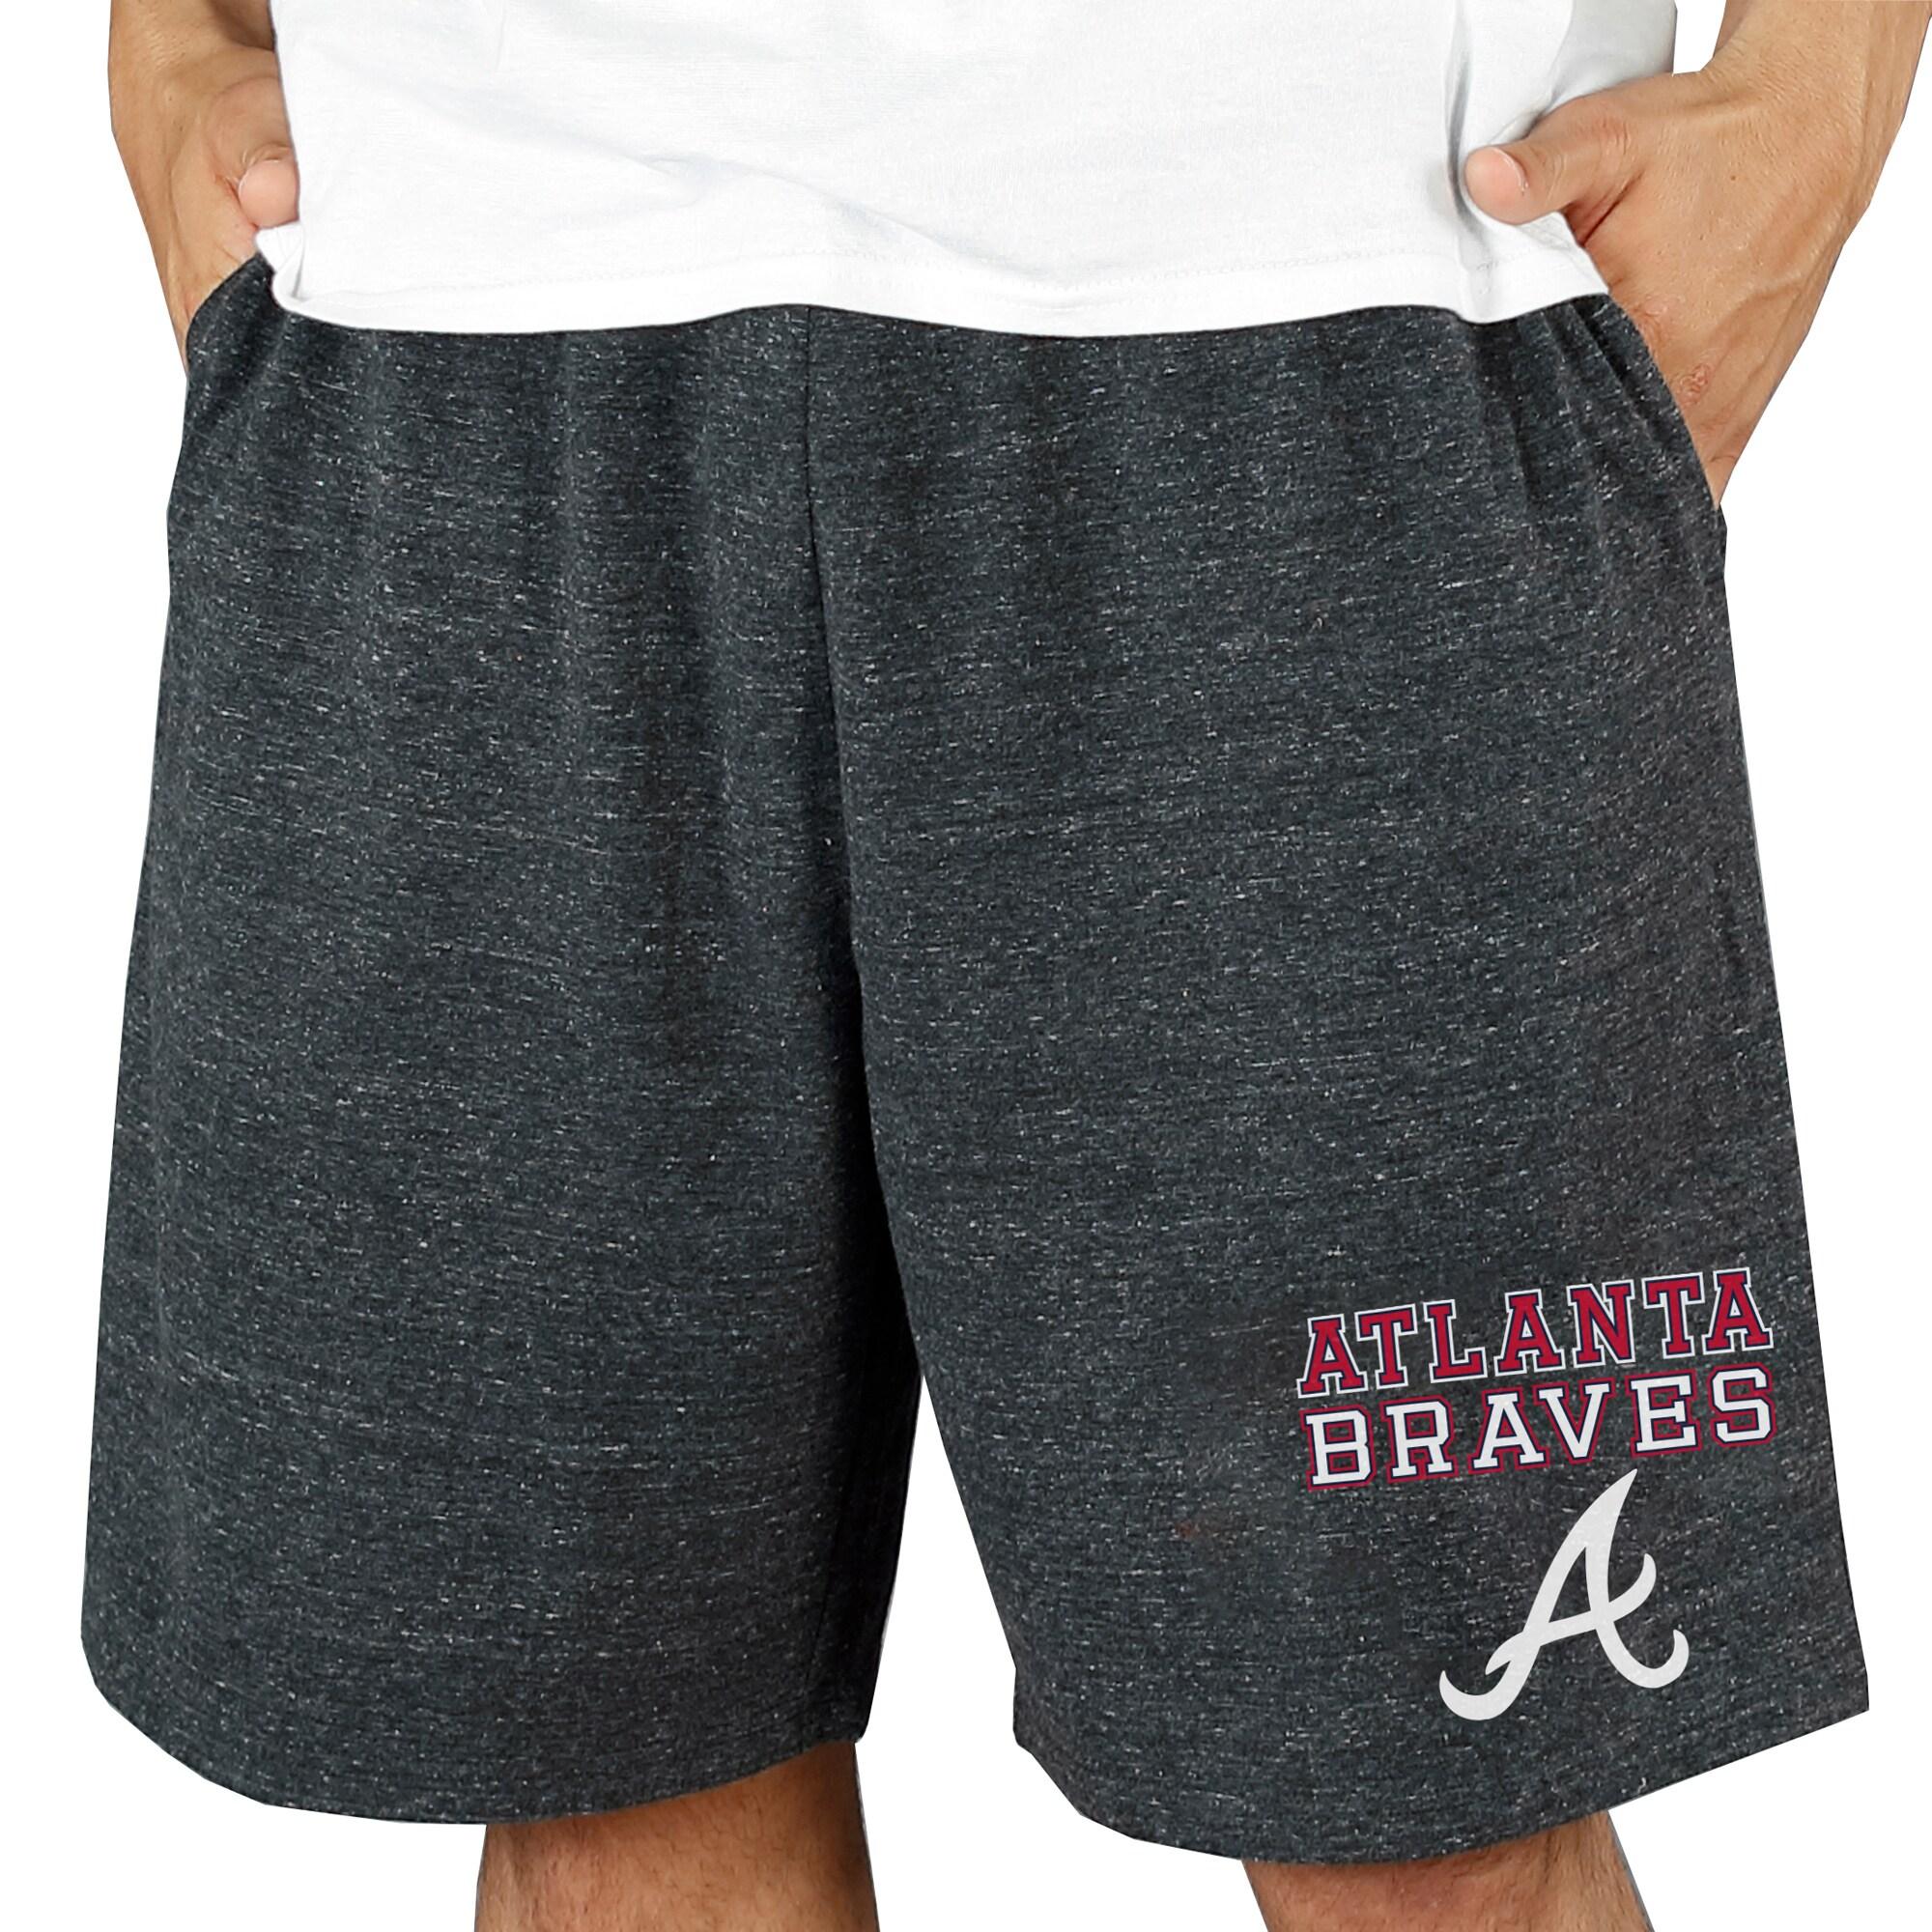 Atlanta Braves Concepts Sport Pitch Knit Jam Shorts - Charcoal